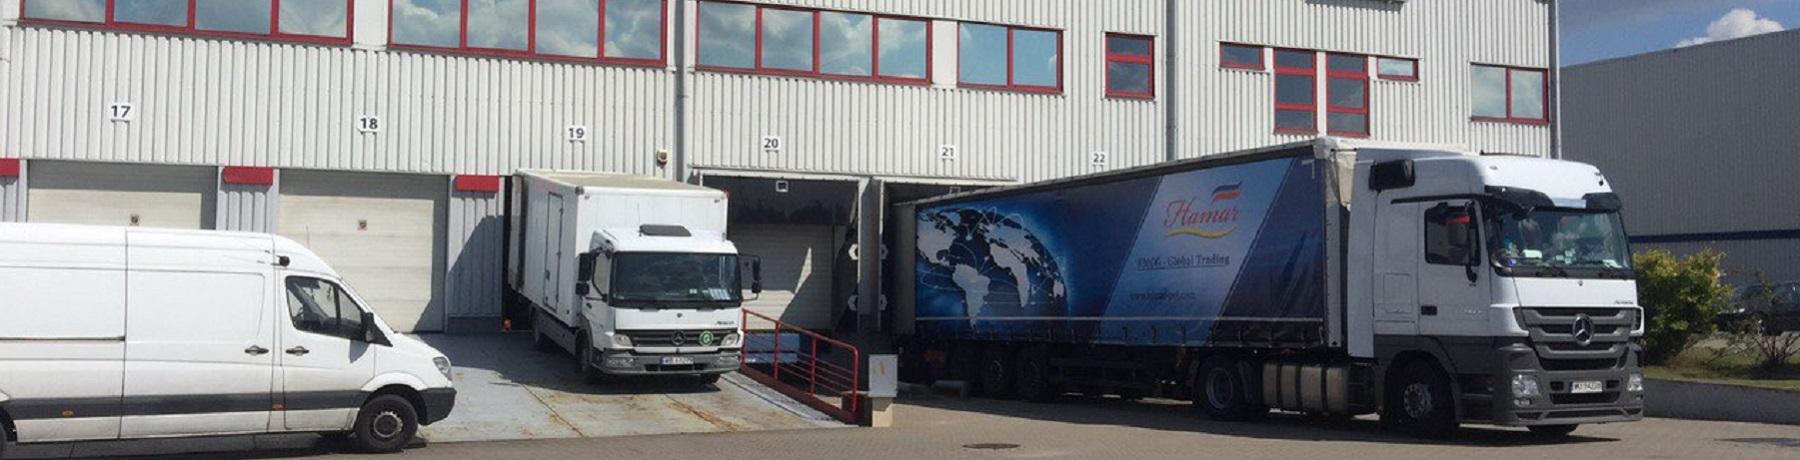 truck-image-1